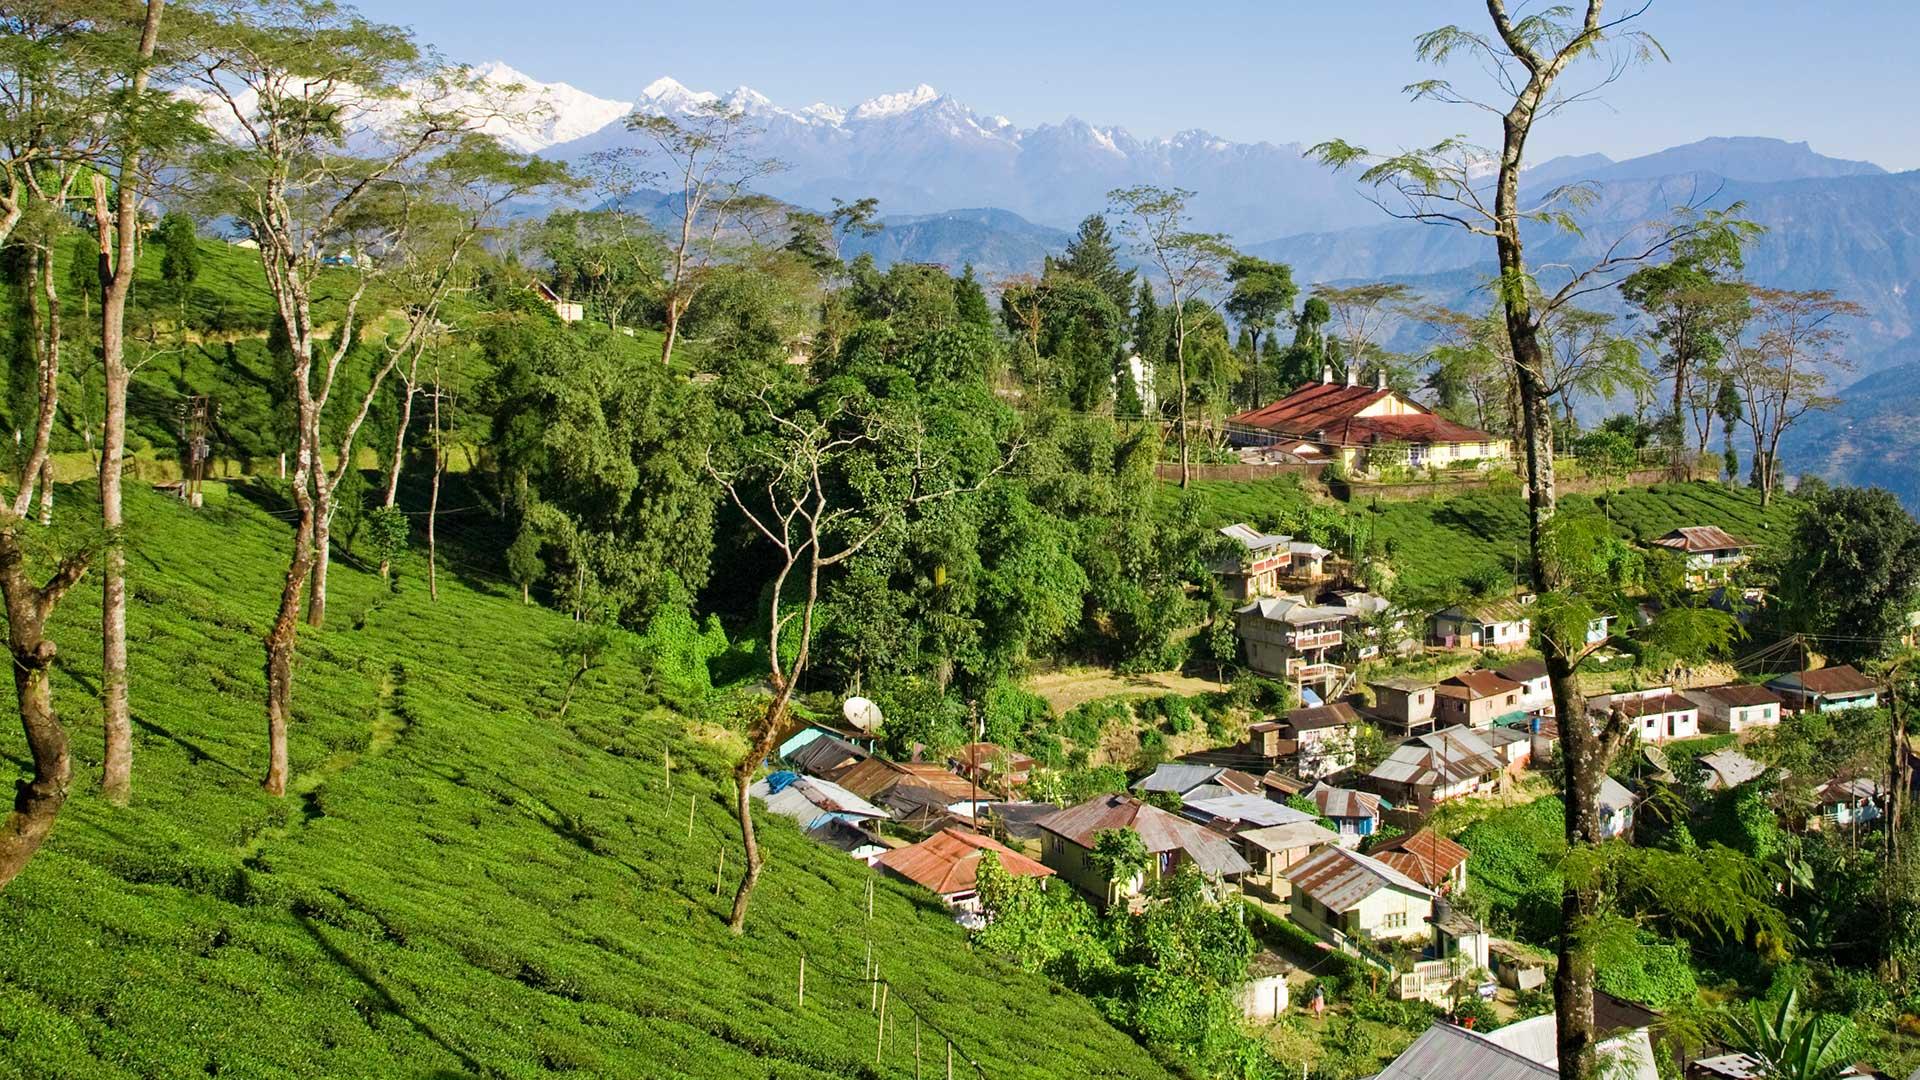 A tea estate in Darjeeling, India